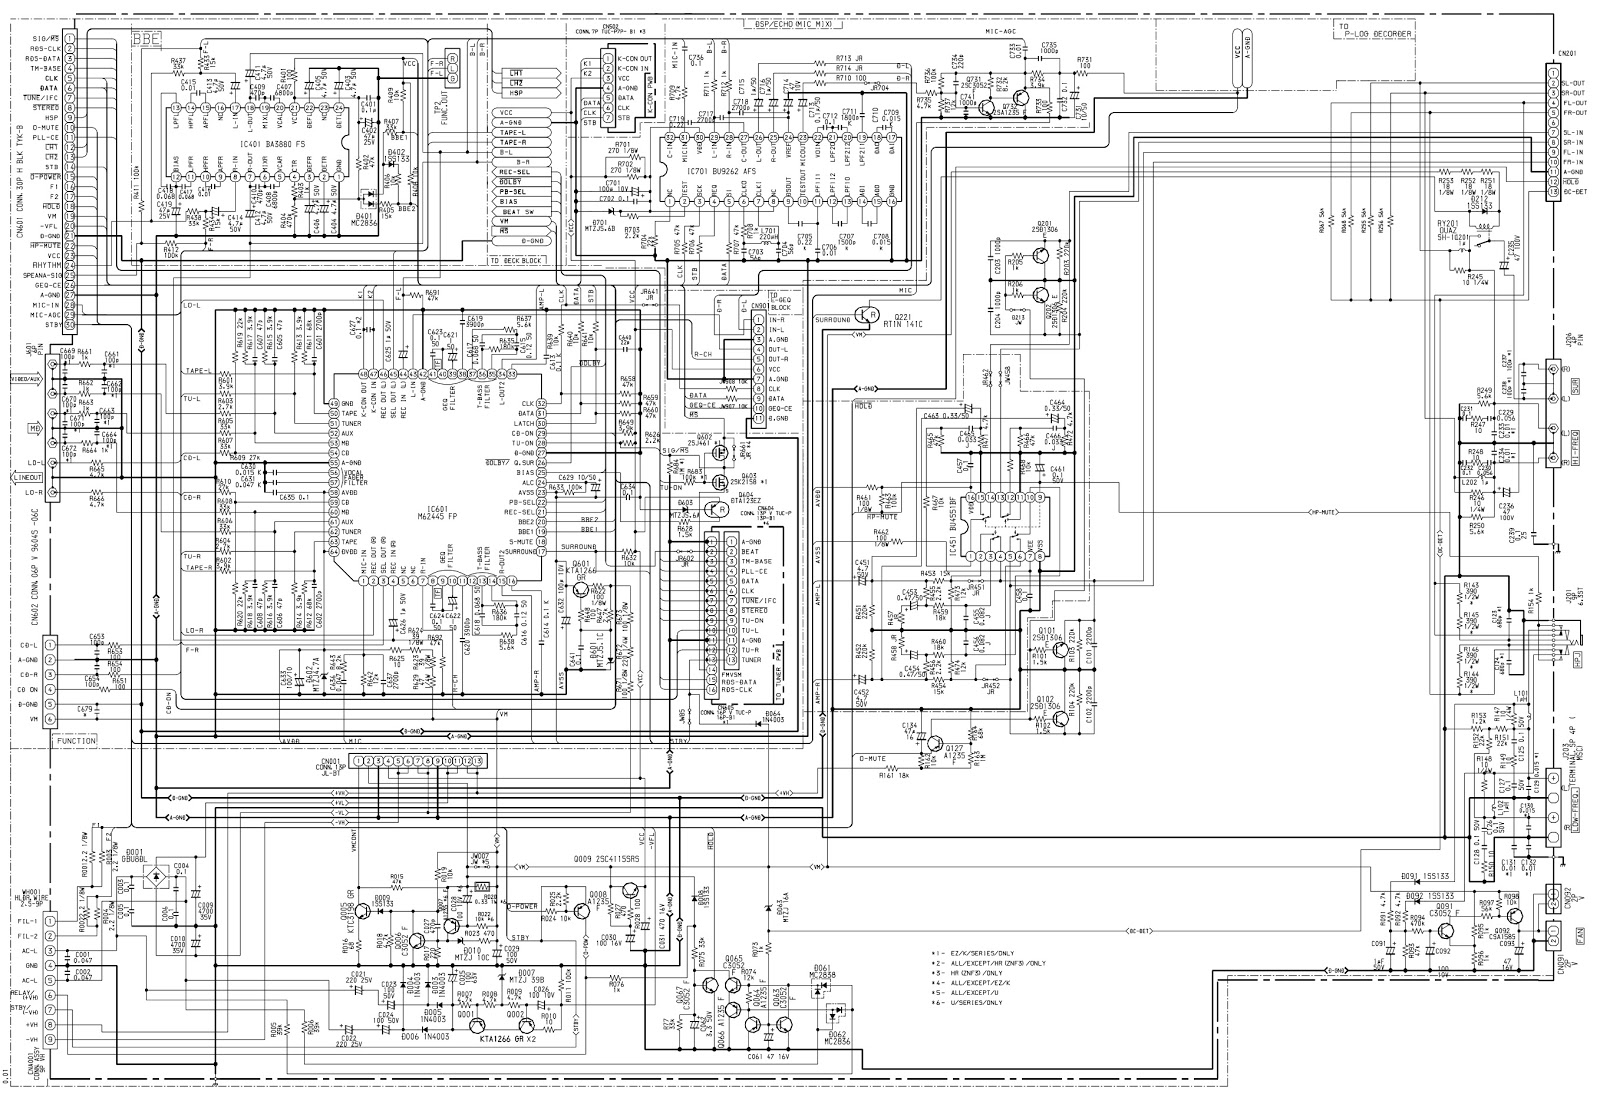 vivitar wiring diagram diagram database regvivitar wiring diagram wiring diagram aiwa wiring diagram wiring library diagram [ 1600 x 1104 Pixel ]